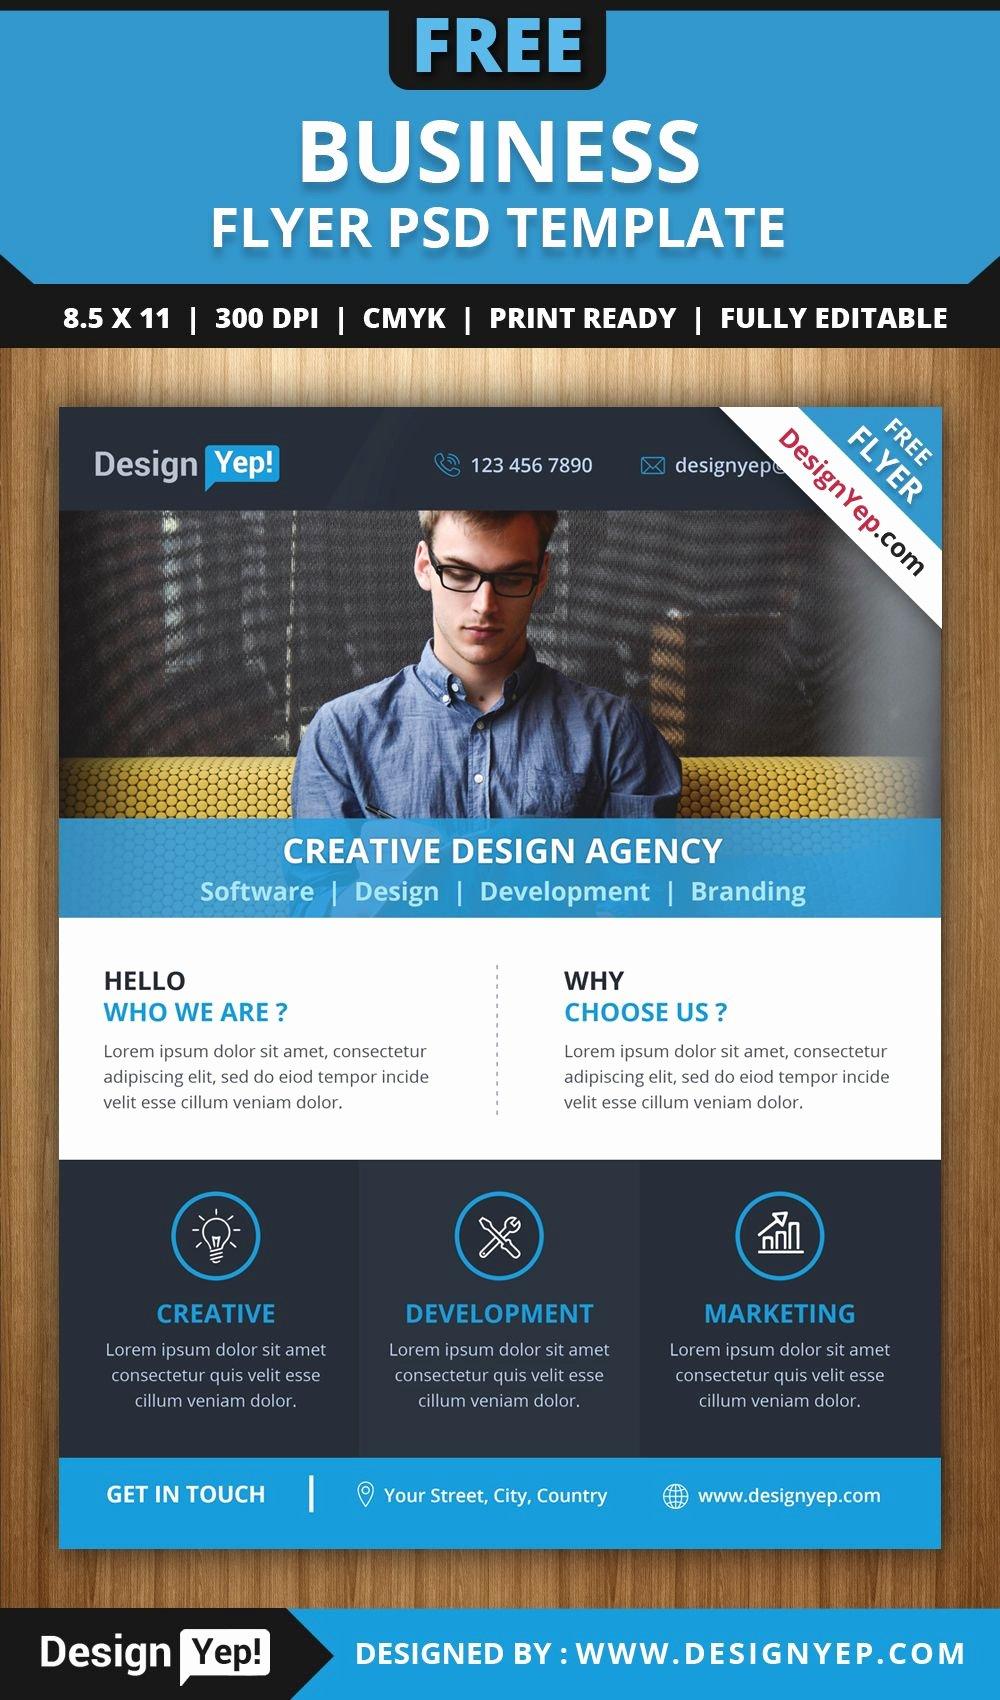 Free Business Flyer Psd Template 6666 Designyep